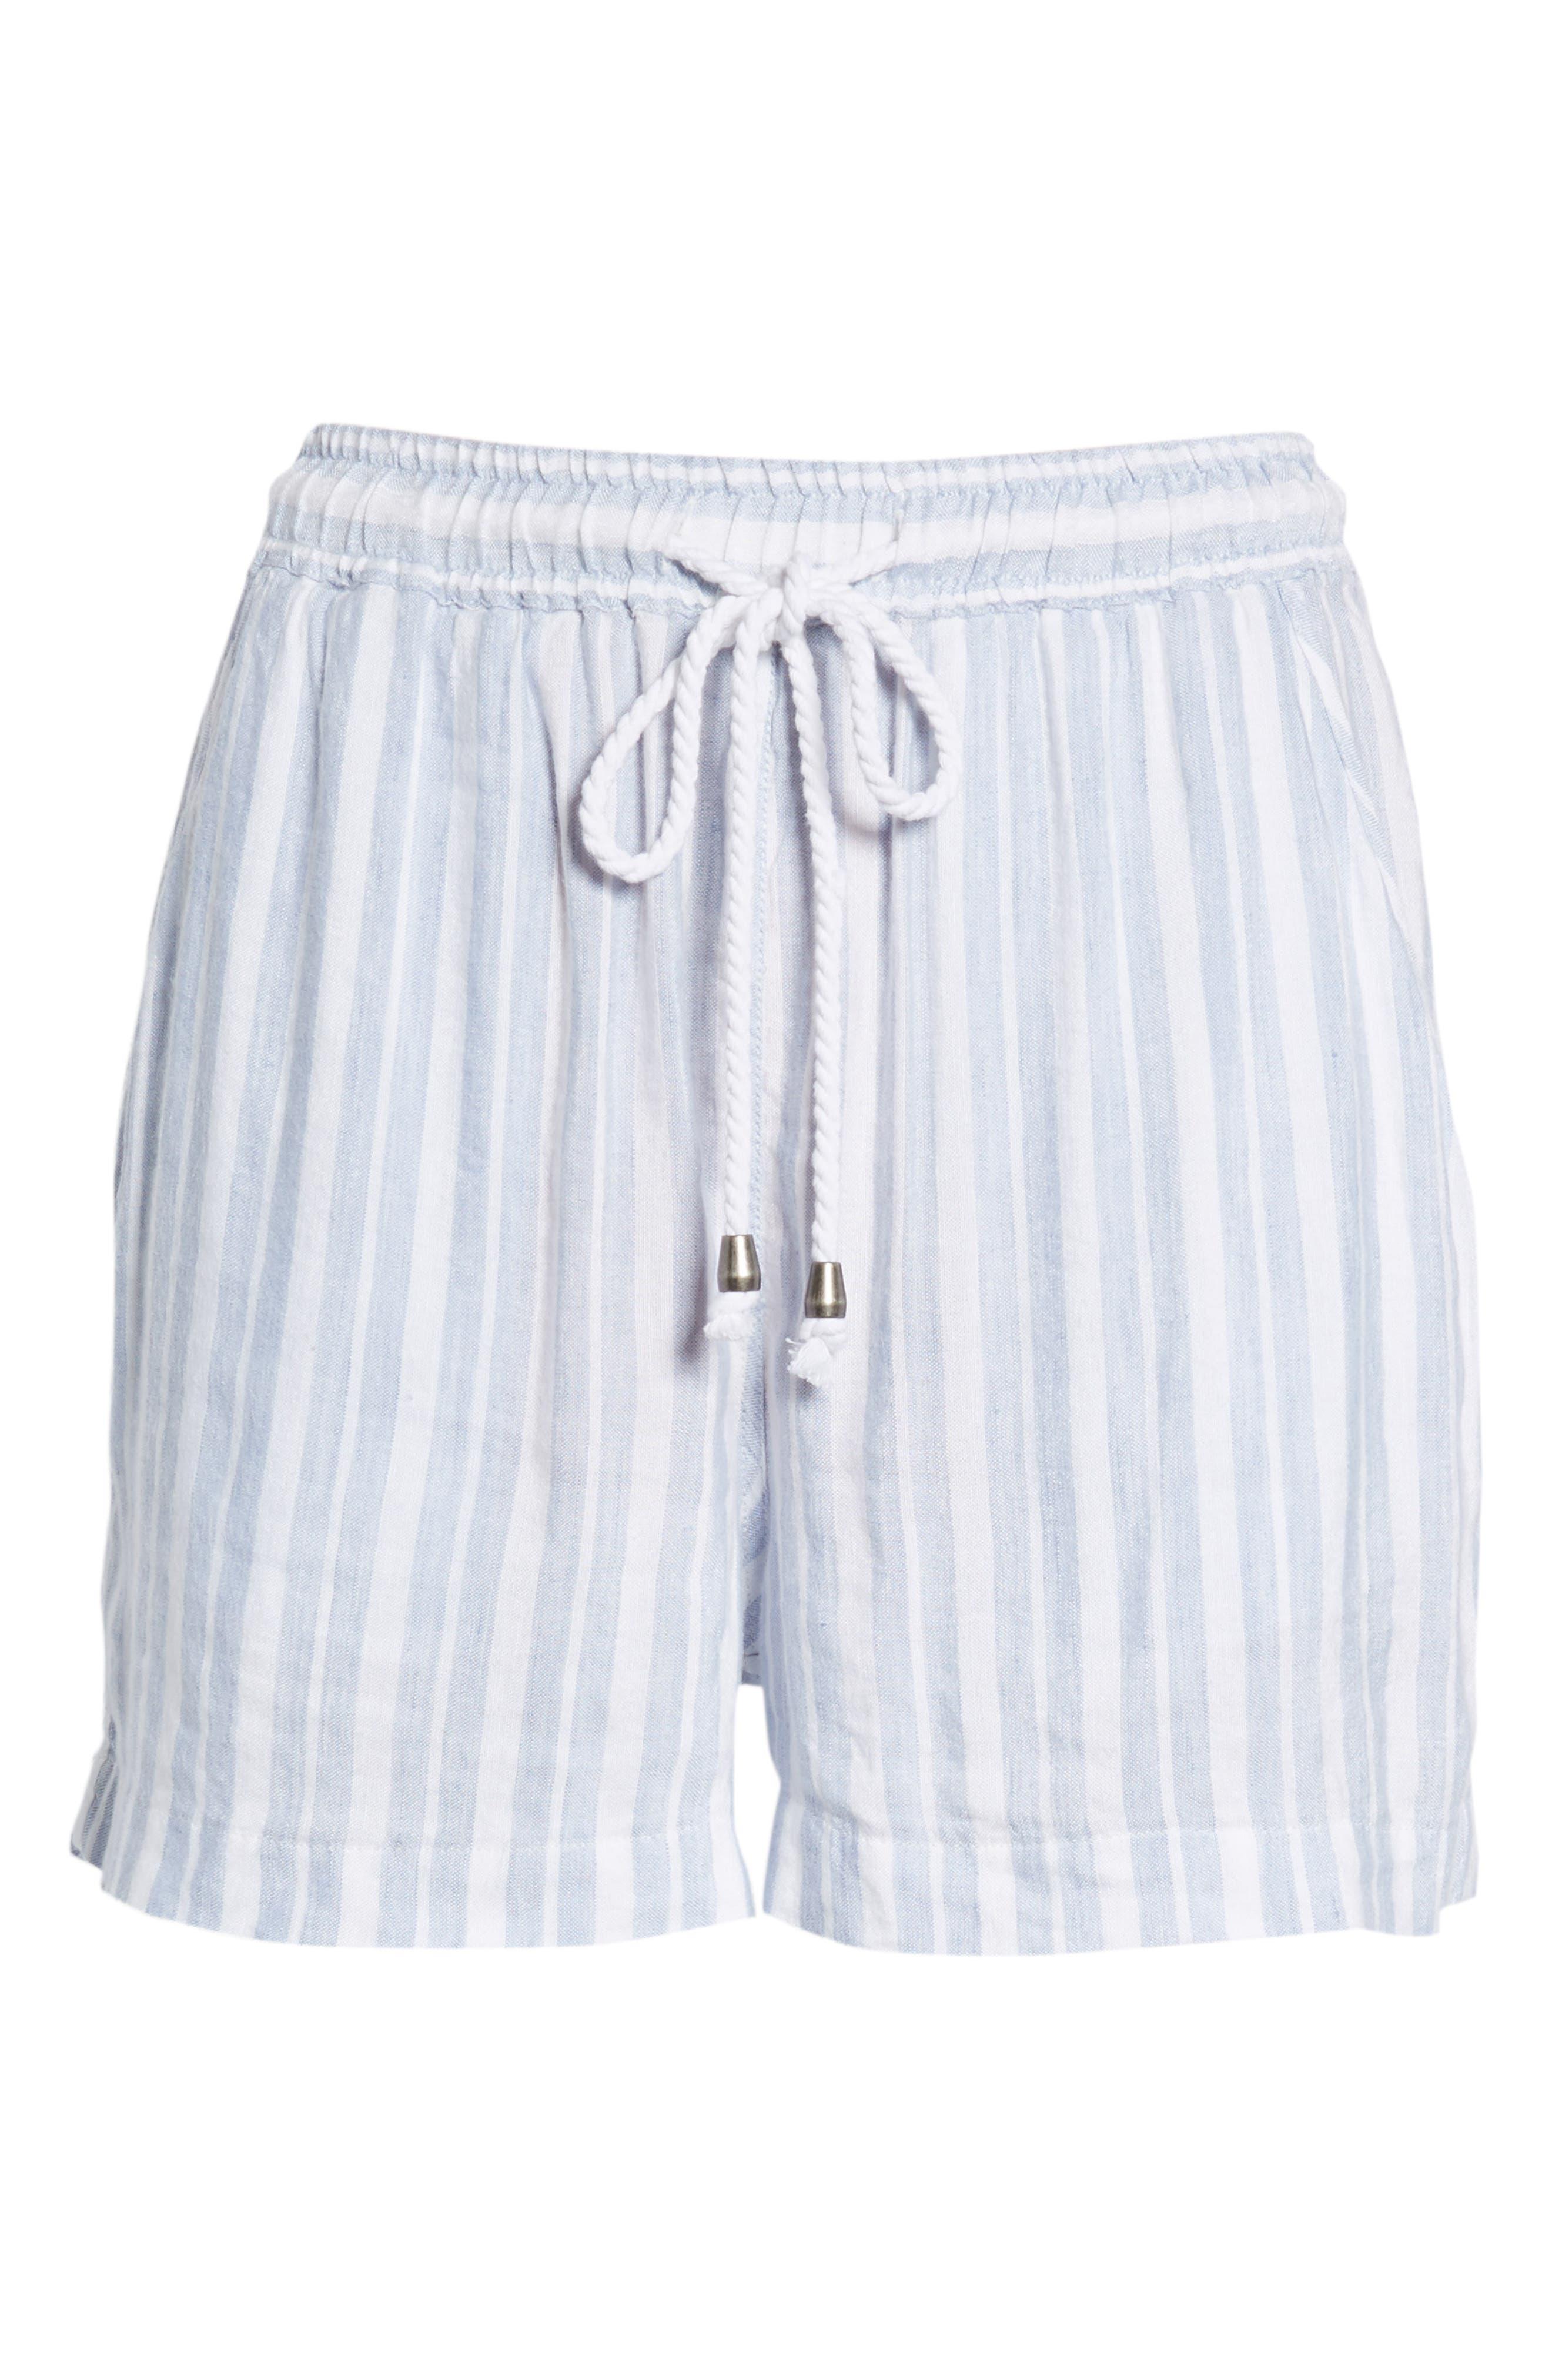 Brea Shorts,                             Alternate thumbnail 6, color,                             HOLLAND STRIPE